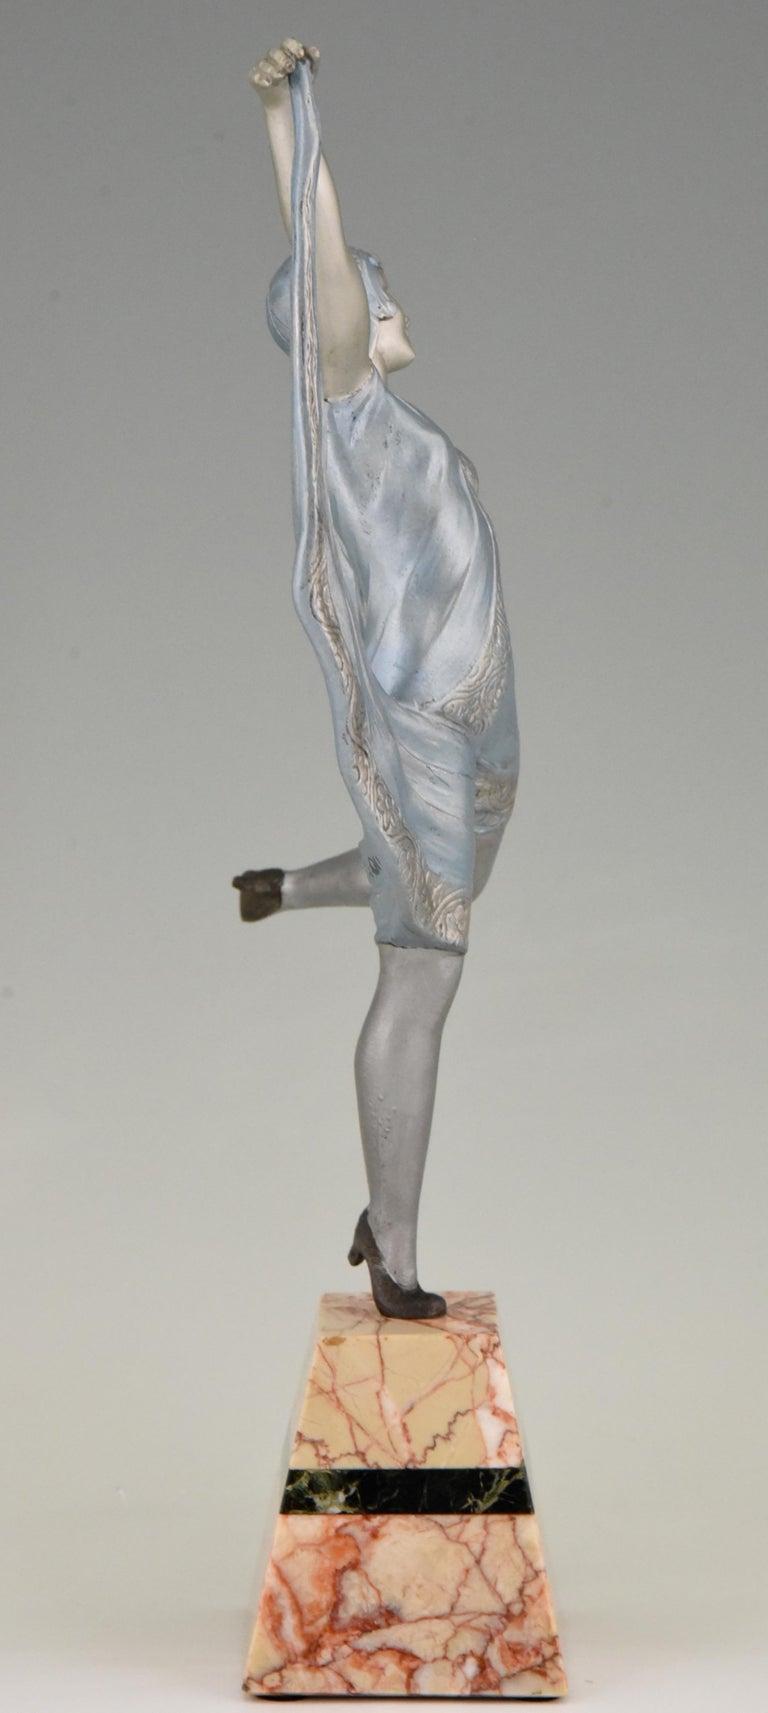 Mid-20th Century Art Deco Sculpture of a Dancer Limousin, France, 1930 For Sale